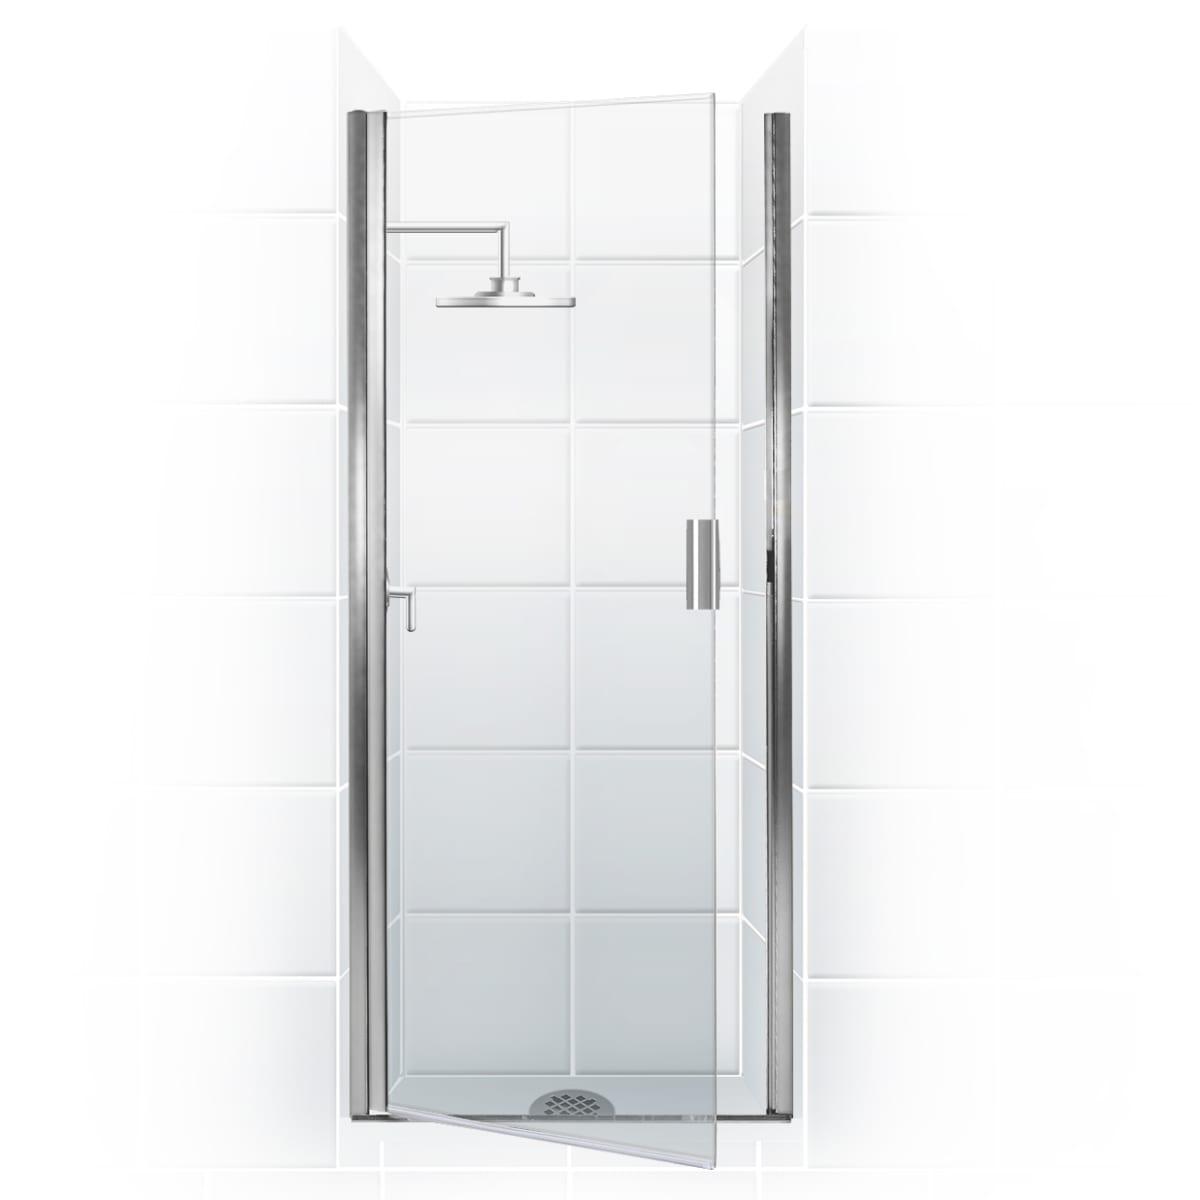 Coastal Shower Doors Pqfr29 83 C